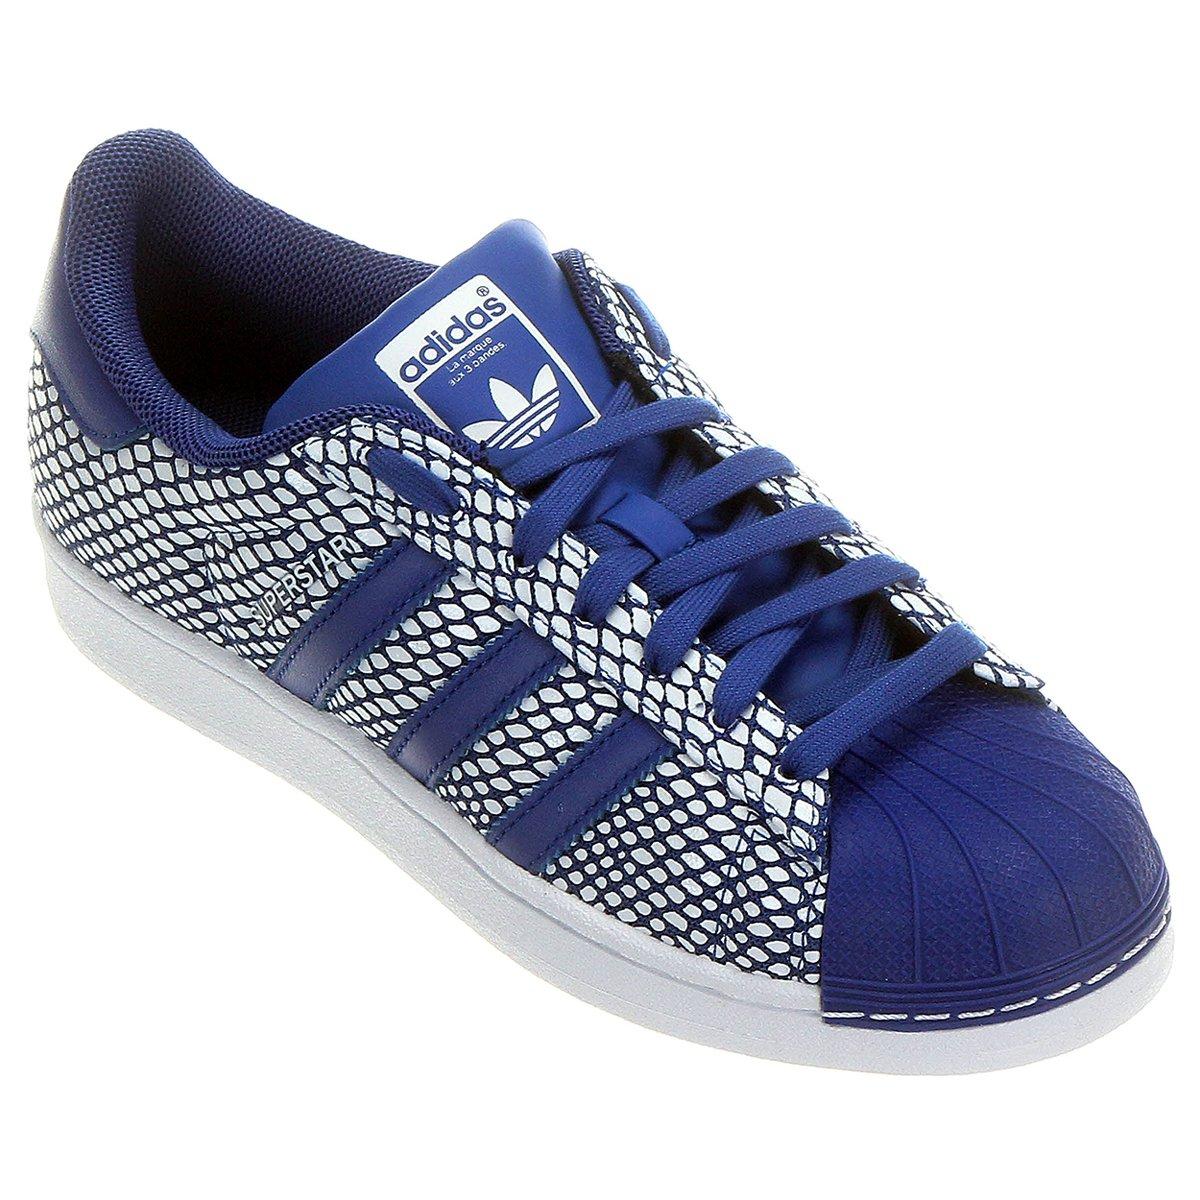 d9a10cefbdd Tênis Adidas Superstar Snake - Compre Agora